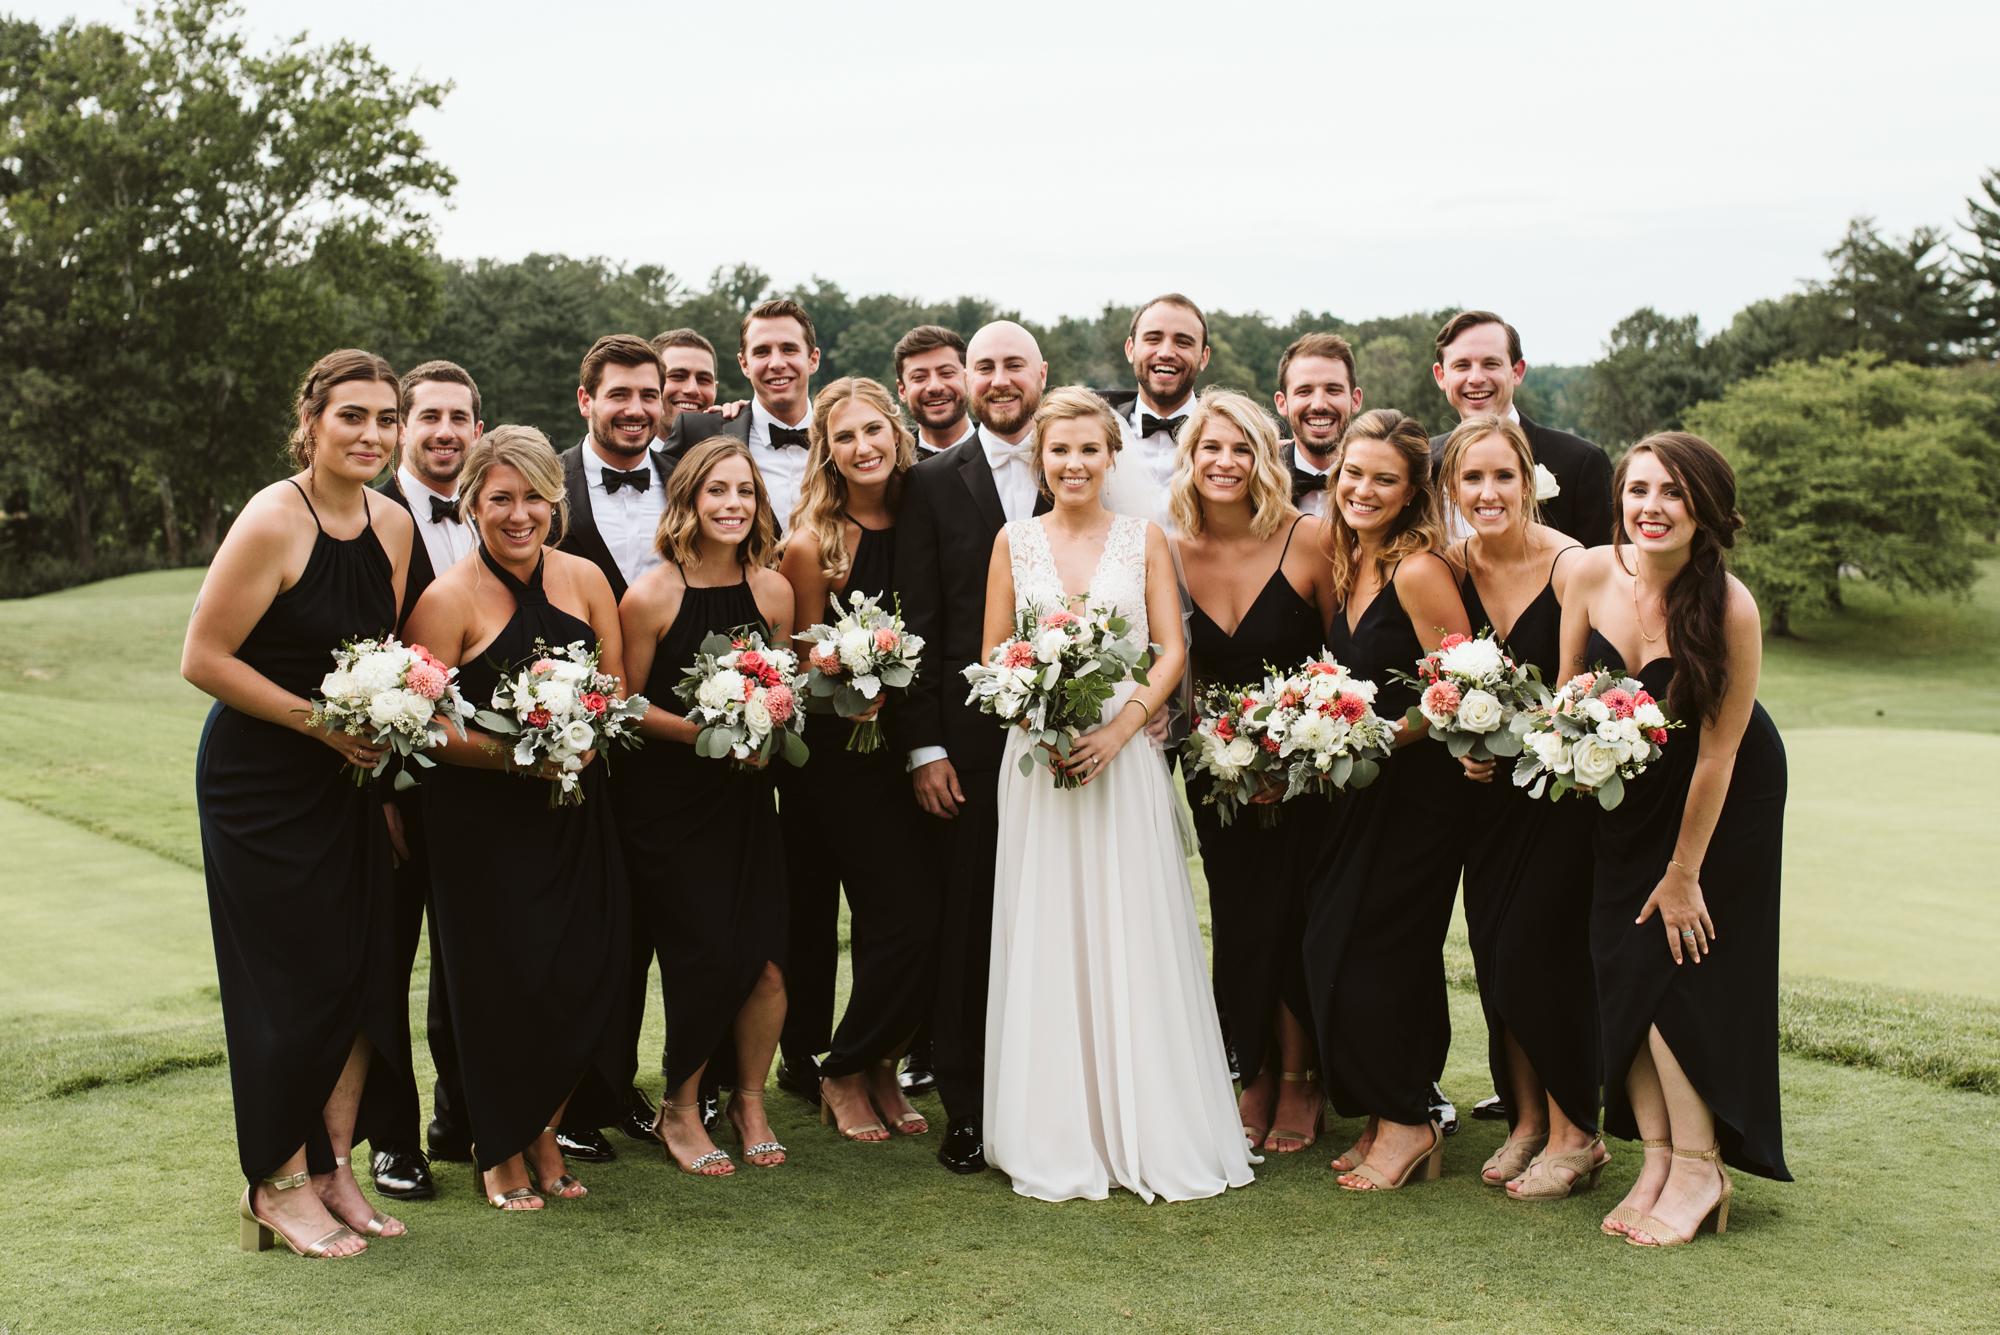 Elegant, Columbia Country Club, Chevy Chase Maryland, Baltimore Wedding Photographer, Classic, Traditional, Jewish Wedding, Wedding Party Portrait, BHLDN, Shona Joy, Golf Course